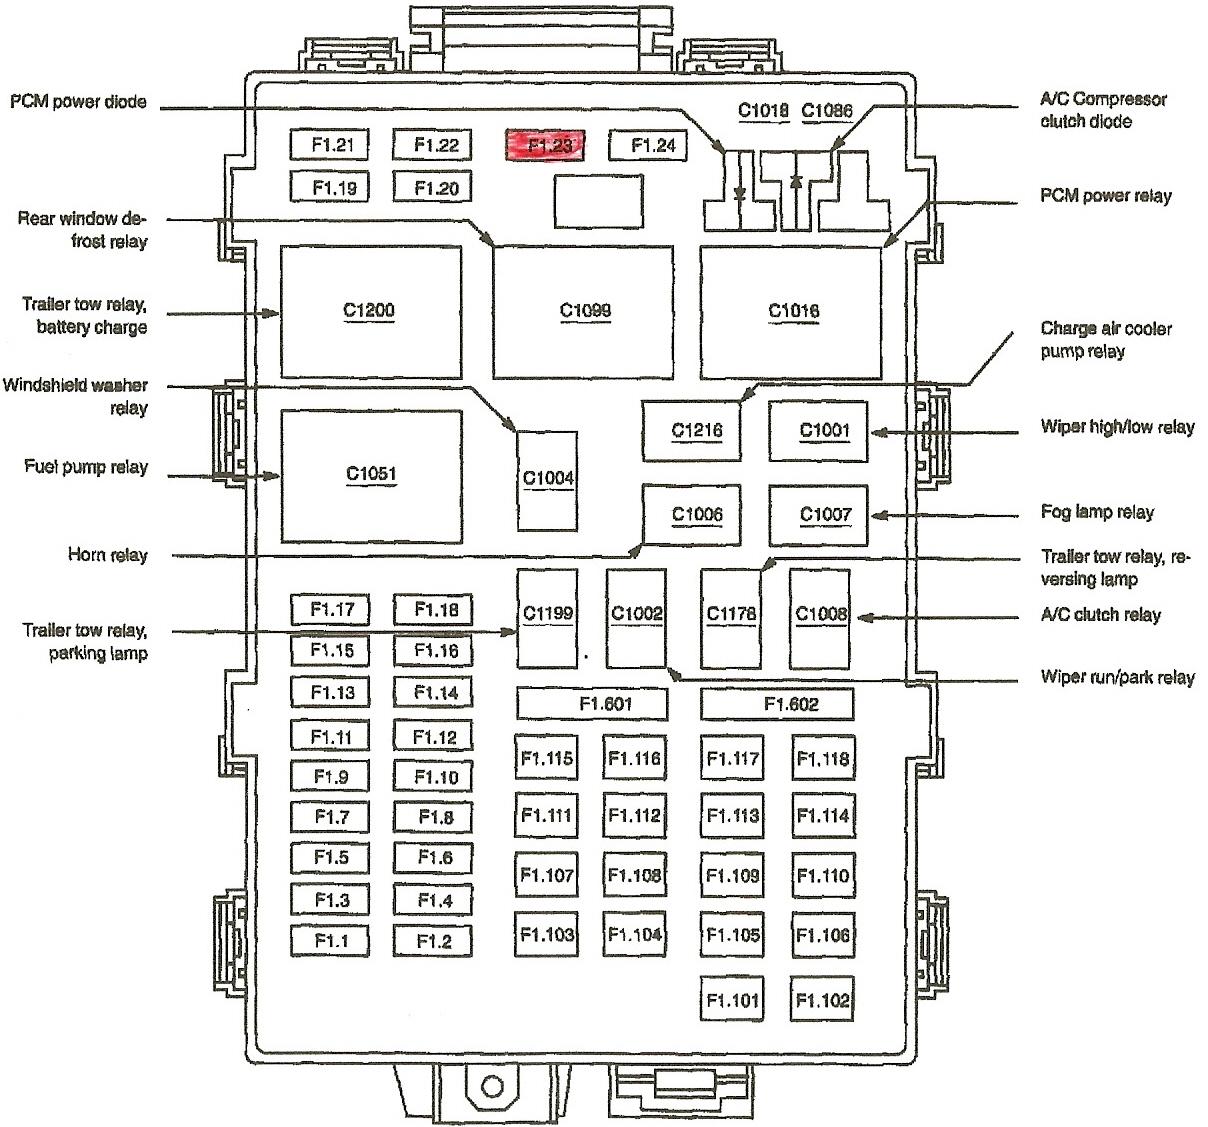 Swell Ford Ba Fuse Box Diagram Wiring Diagram Database Wiring Cloud Xortanetembamohammedshrineorg